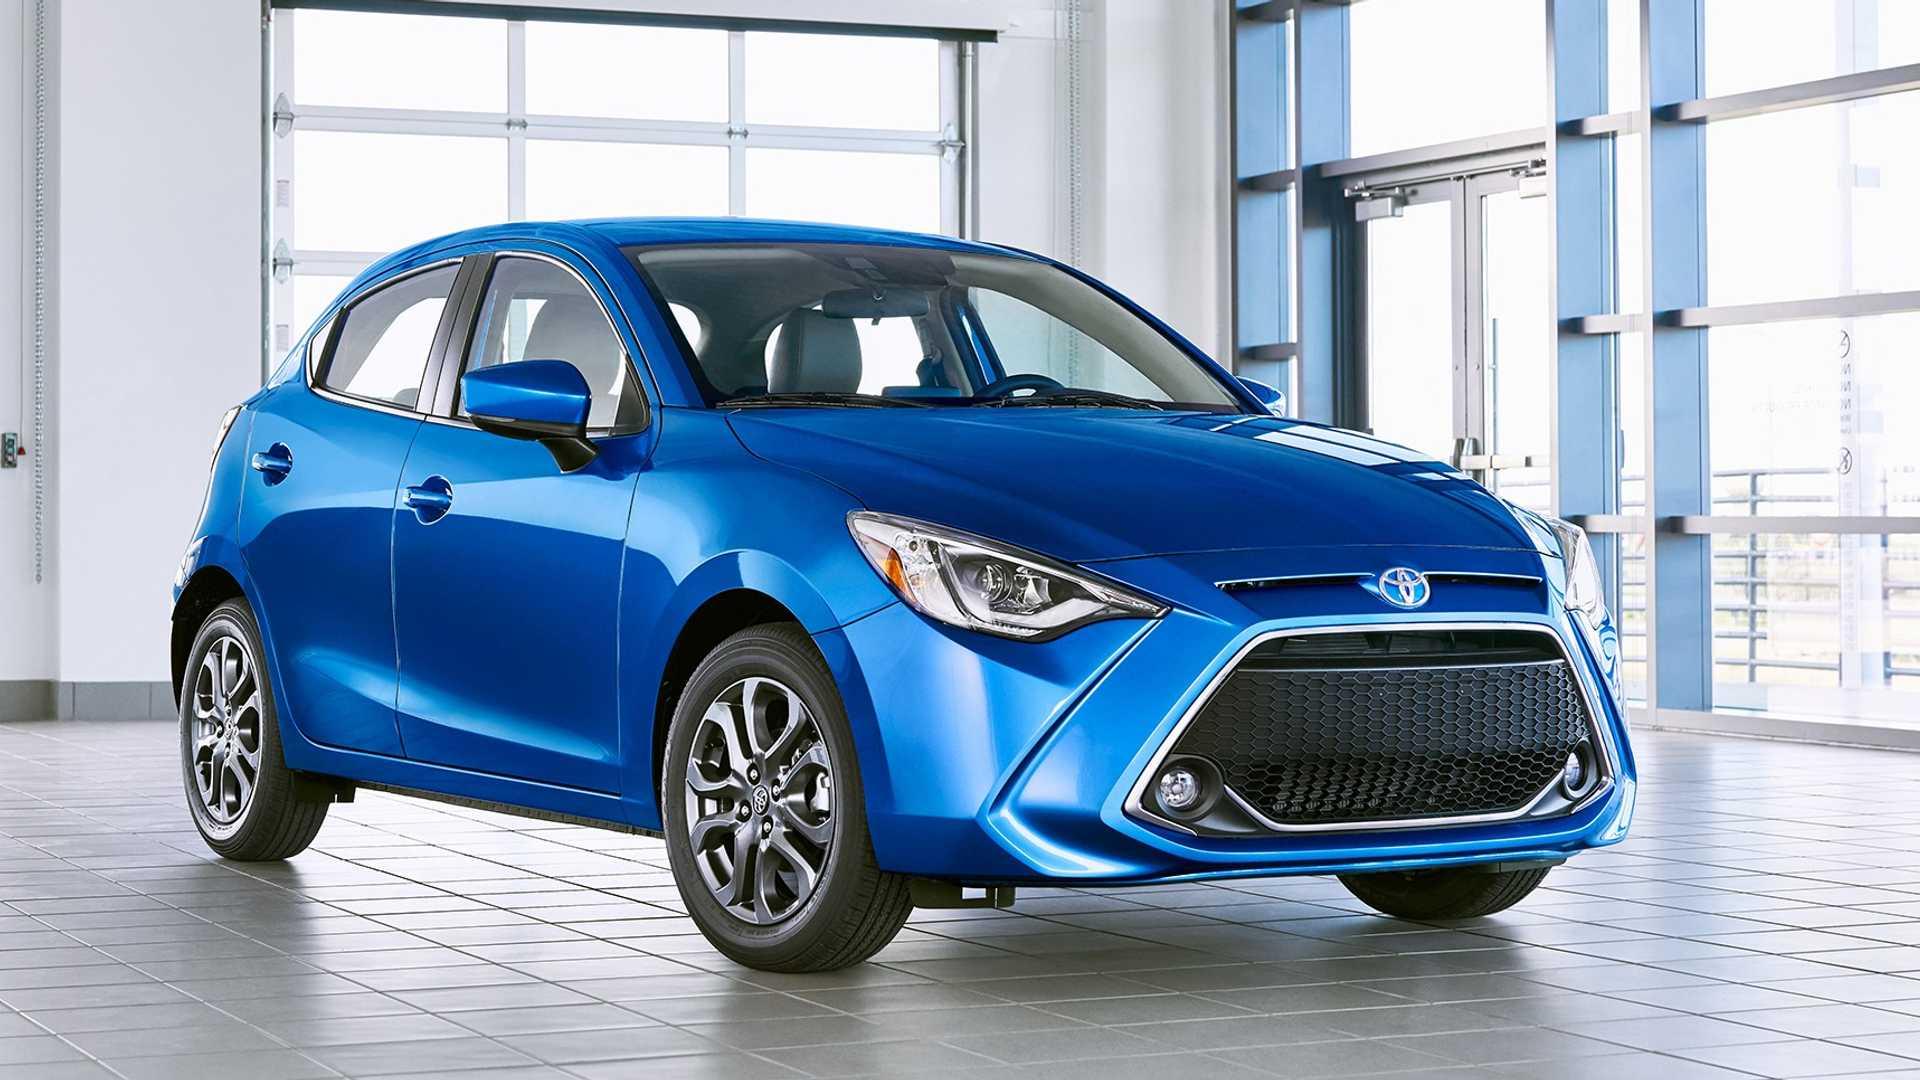 Toyota to Premiere Mazda-based Yaris Hatchback at NYAS 2019 4